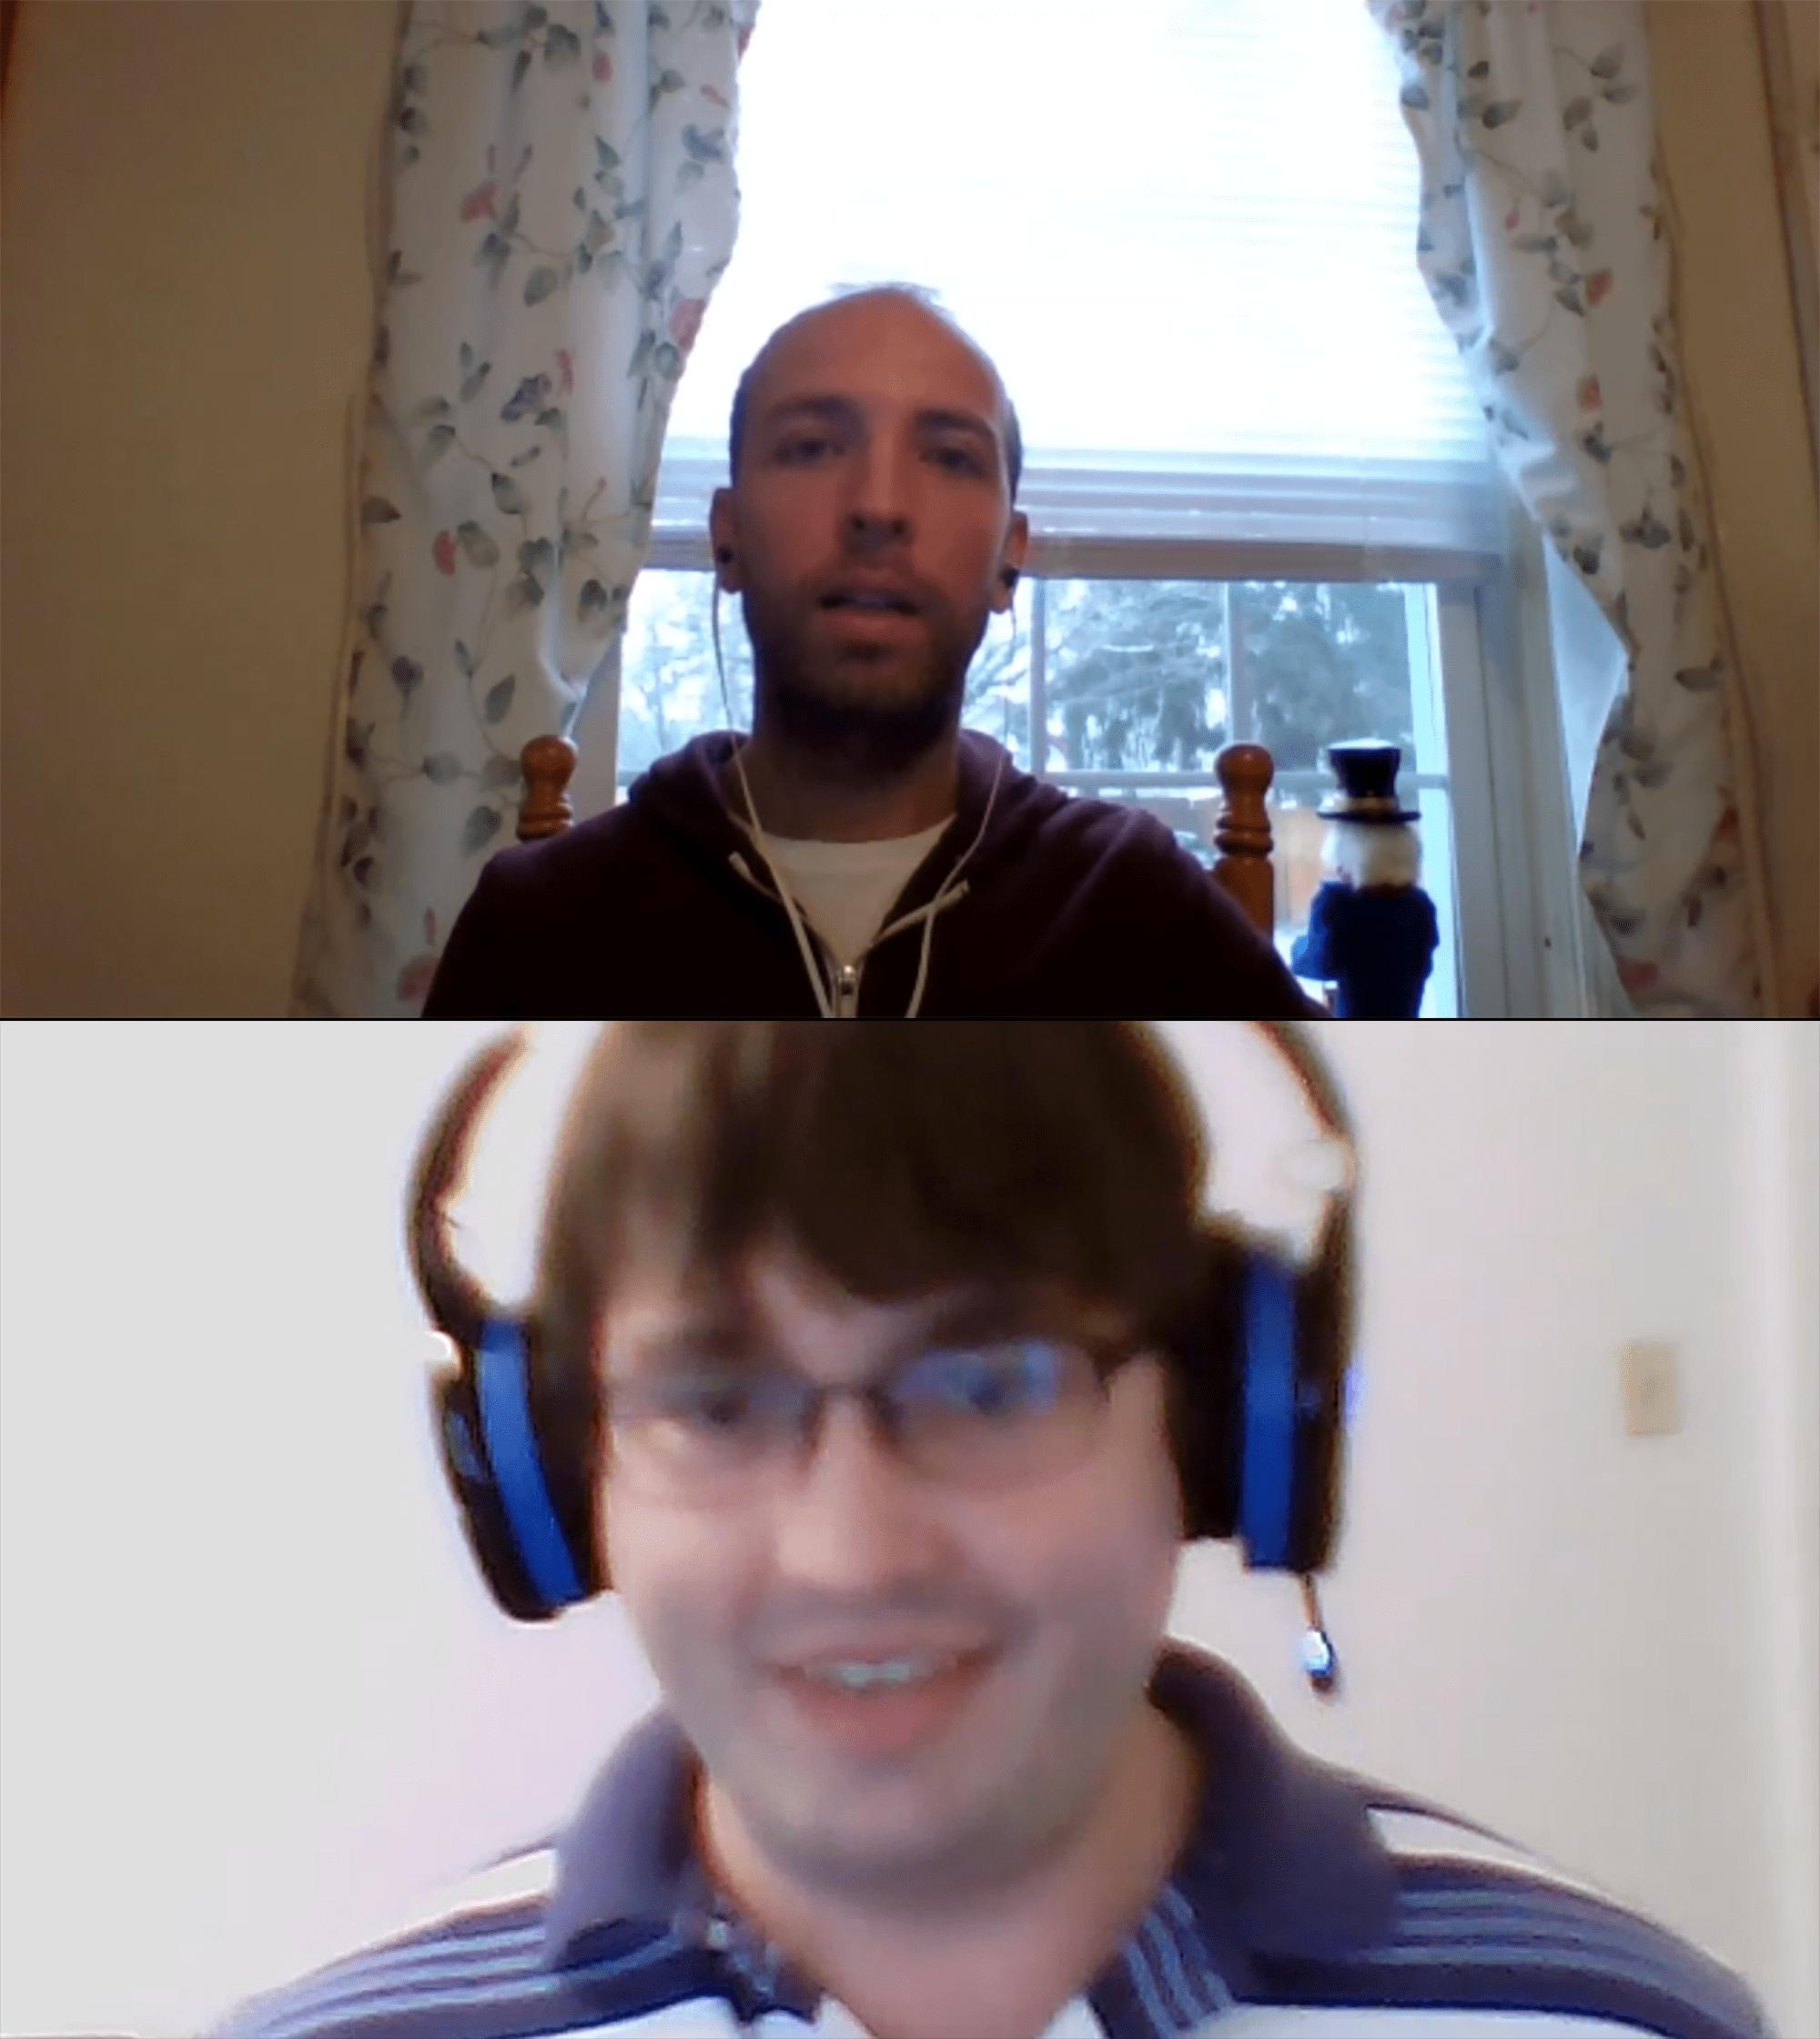 Brian Skype call